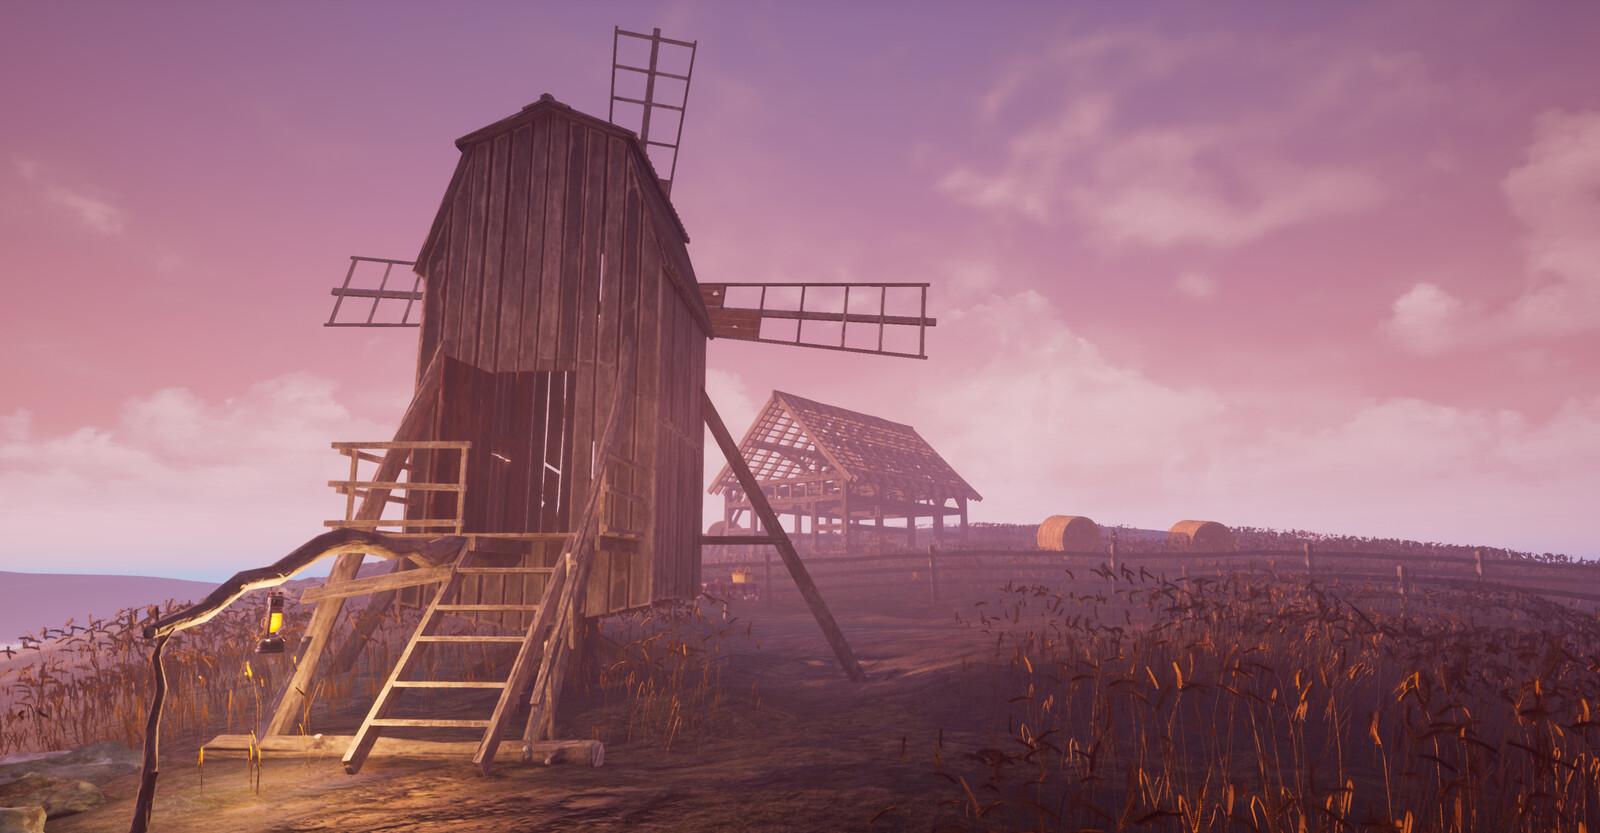 Sunset Farm 2